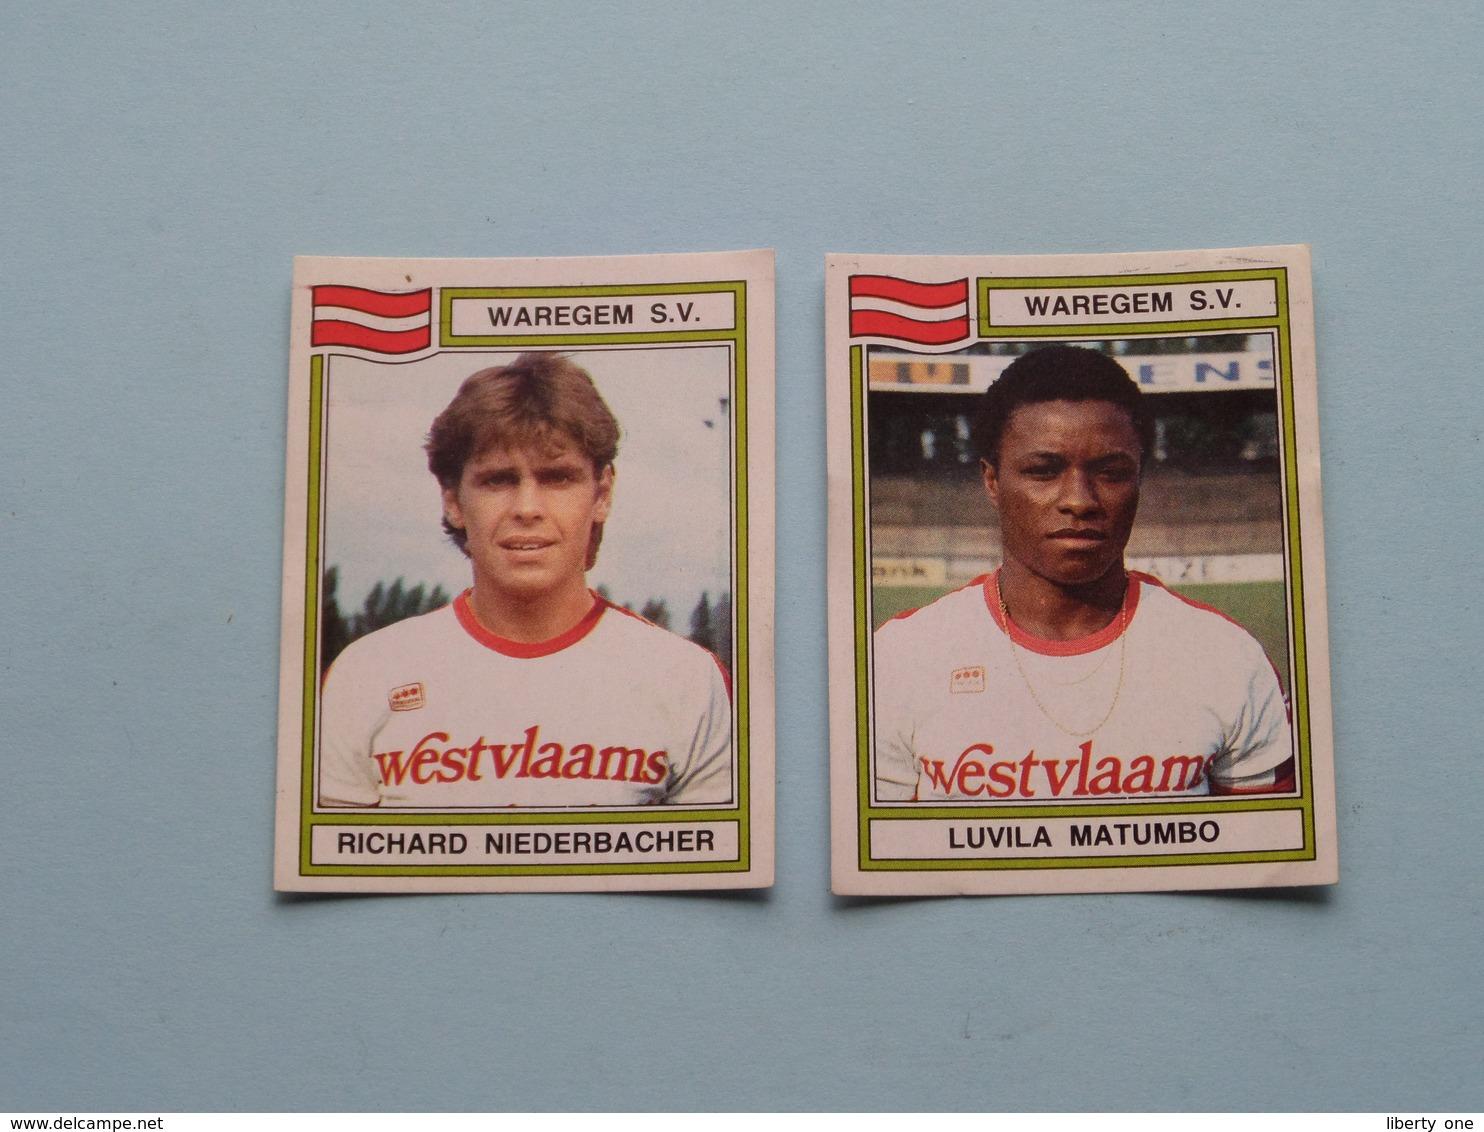 WAREGEM S.V. ( Luvila MATUMBO & Richard NIEDERBACHER ) > FOOTBALL 84 ( Nrs. 304 - 307 ) - Figurine PANINI ! - Trading Cards